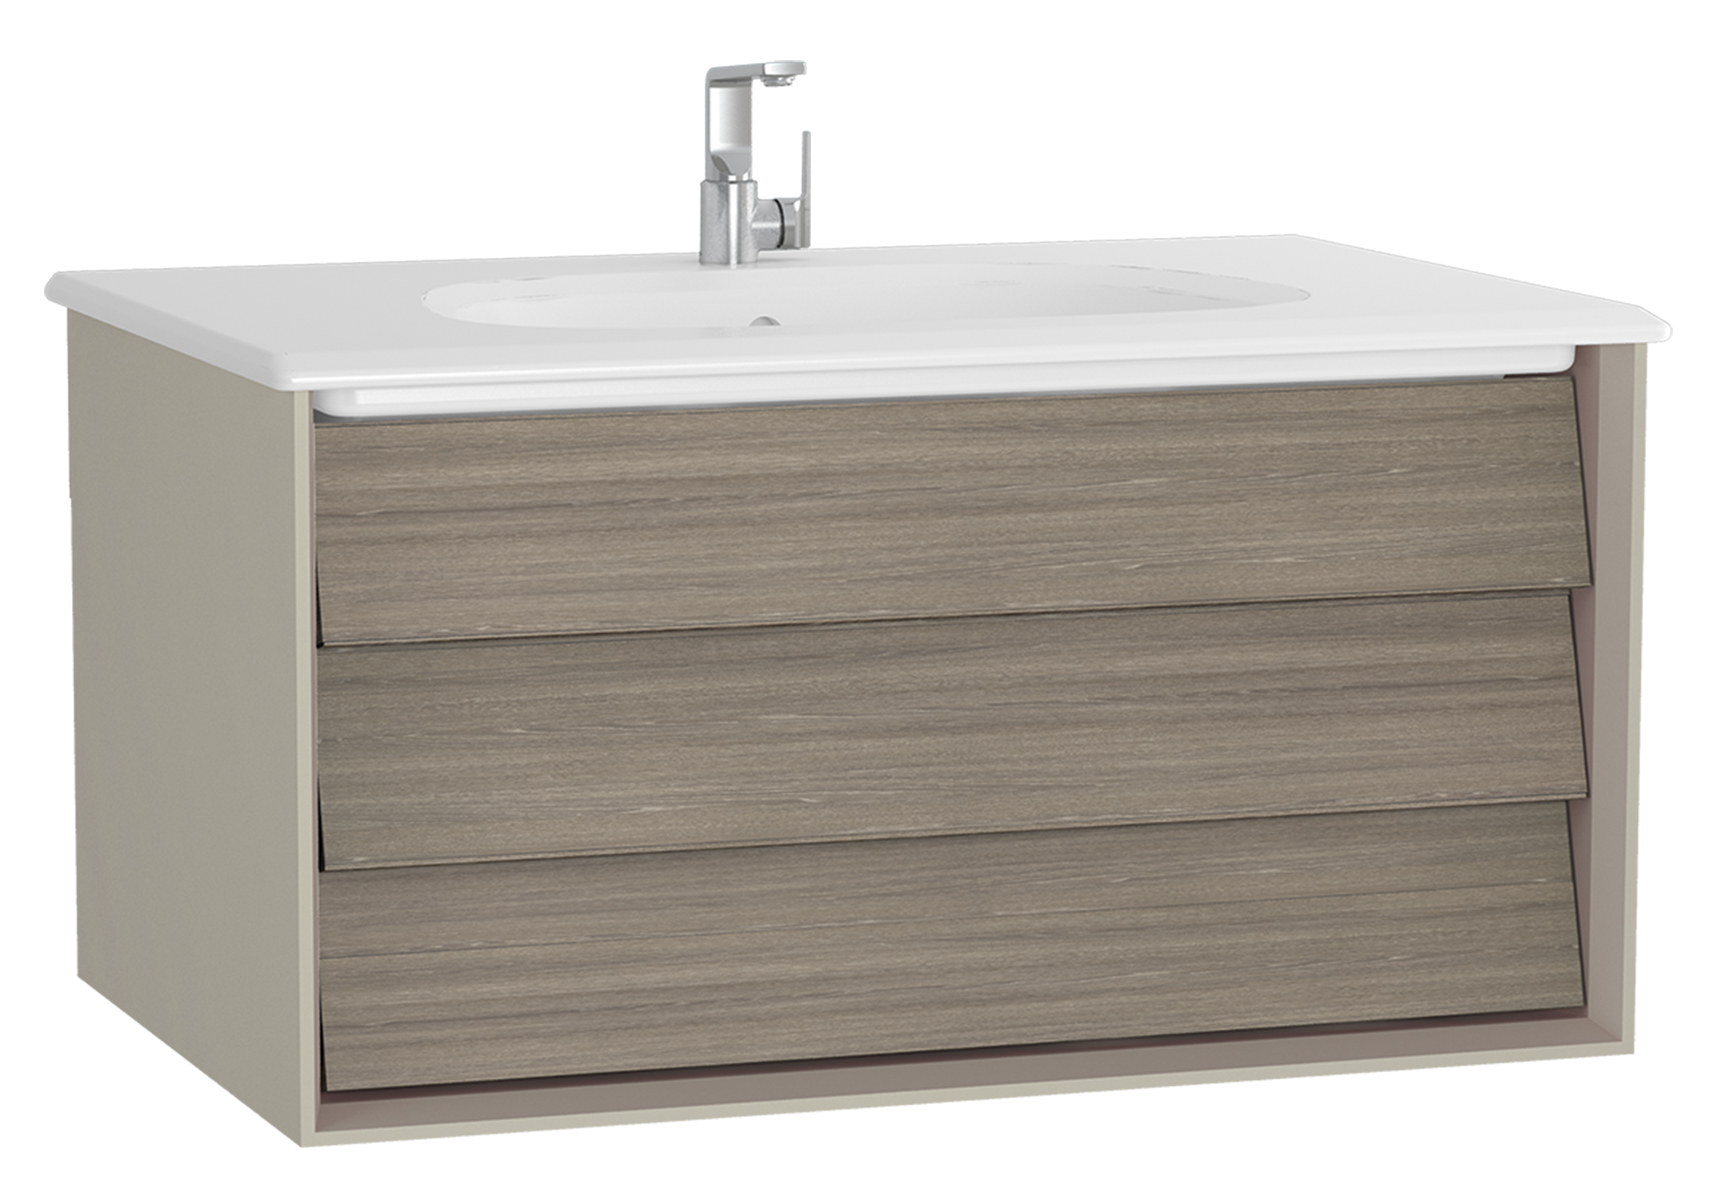 Frame meuble avec plan céramique, 82,5 cm, chêne moka, mat taupe, avec blanc plan céramique